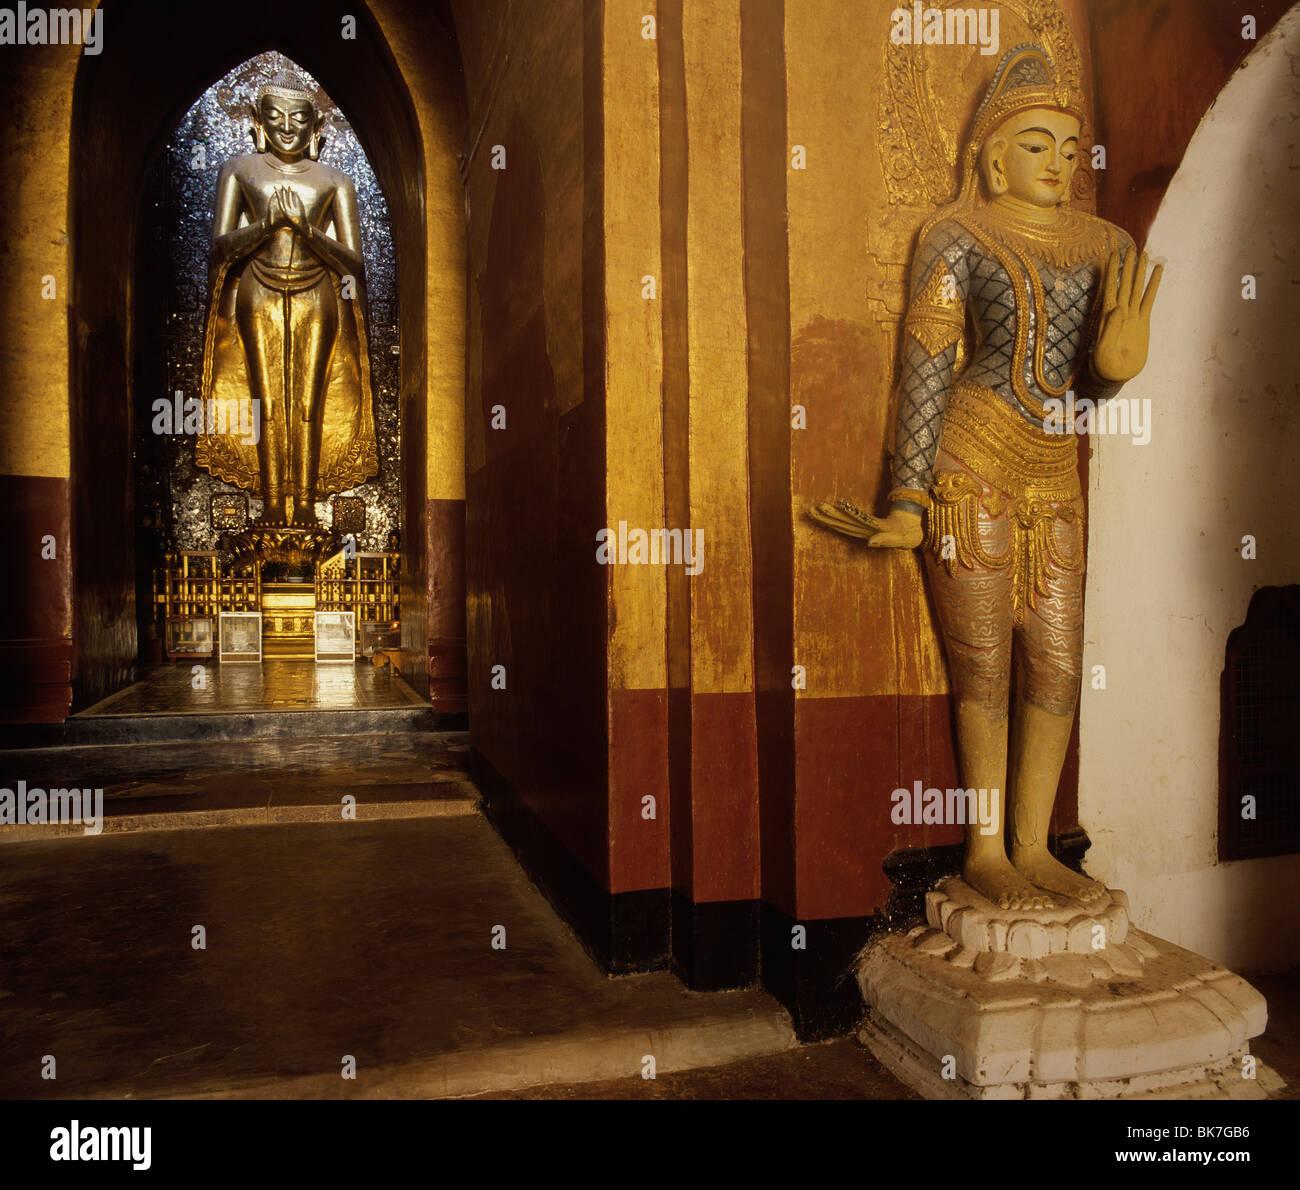 Ananda temple, Bagan (Pagan), Myanmar (Burma), Asia - Stock Image